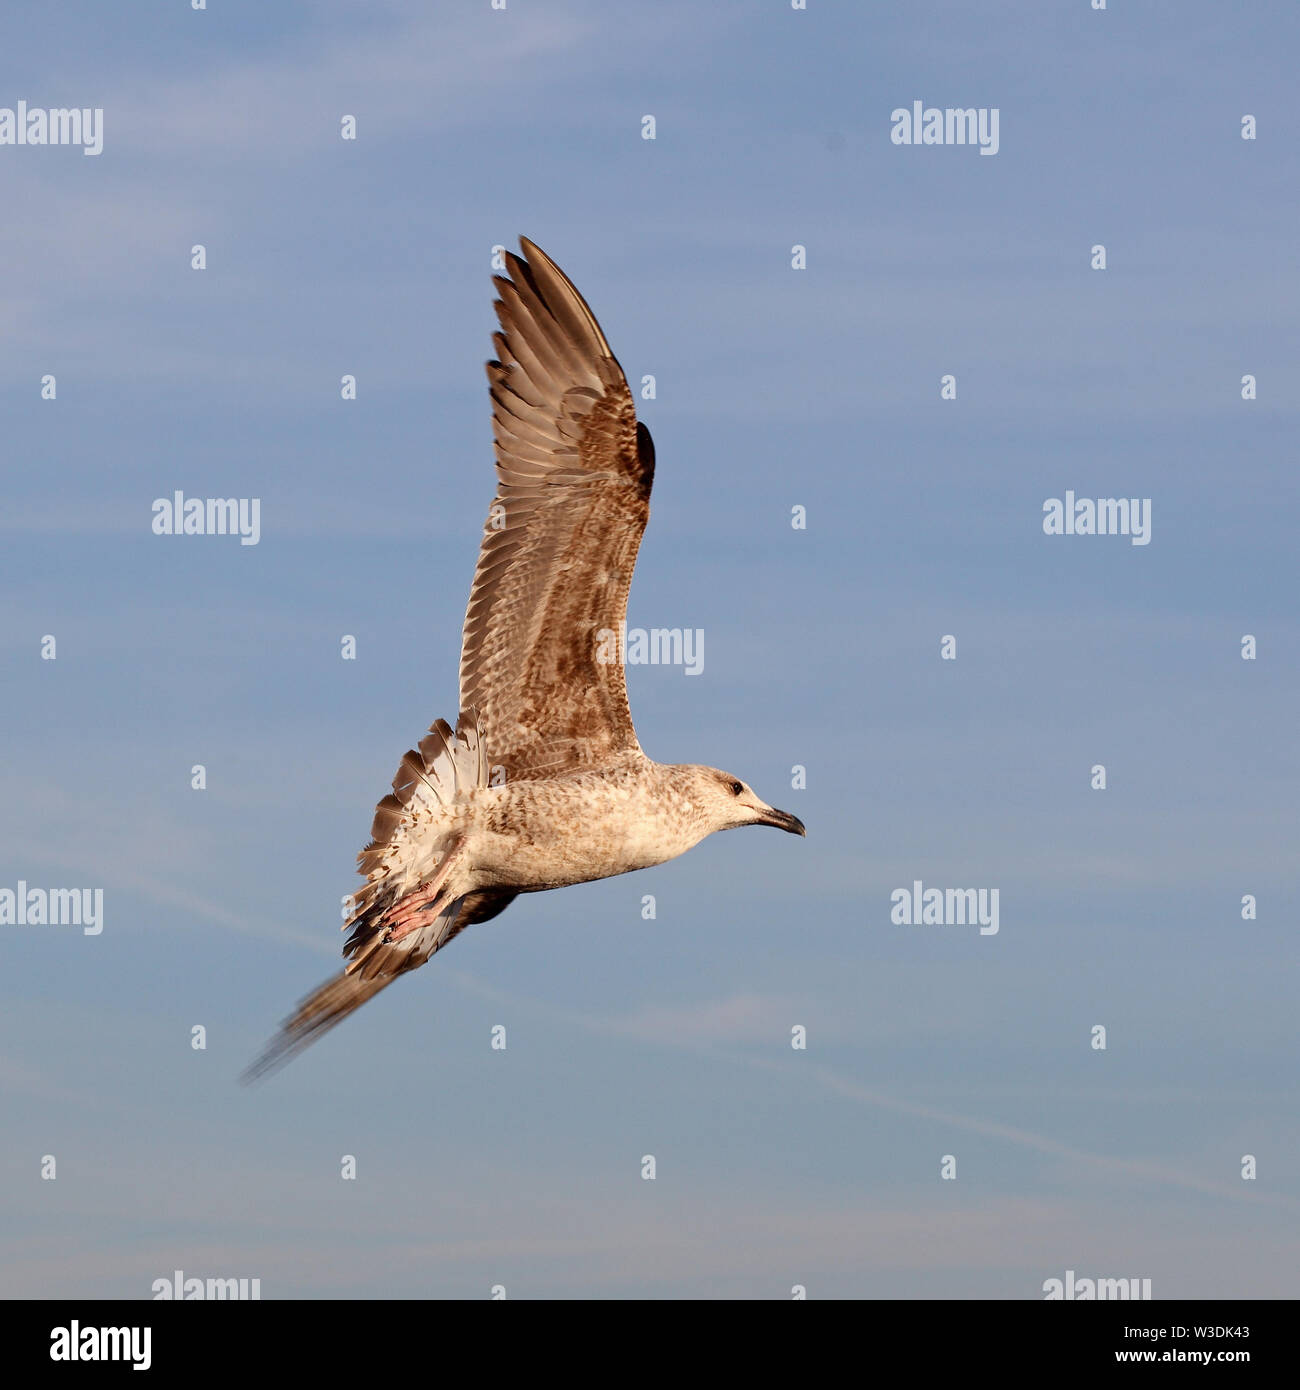 Seagull in Rome Stock Photo